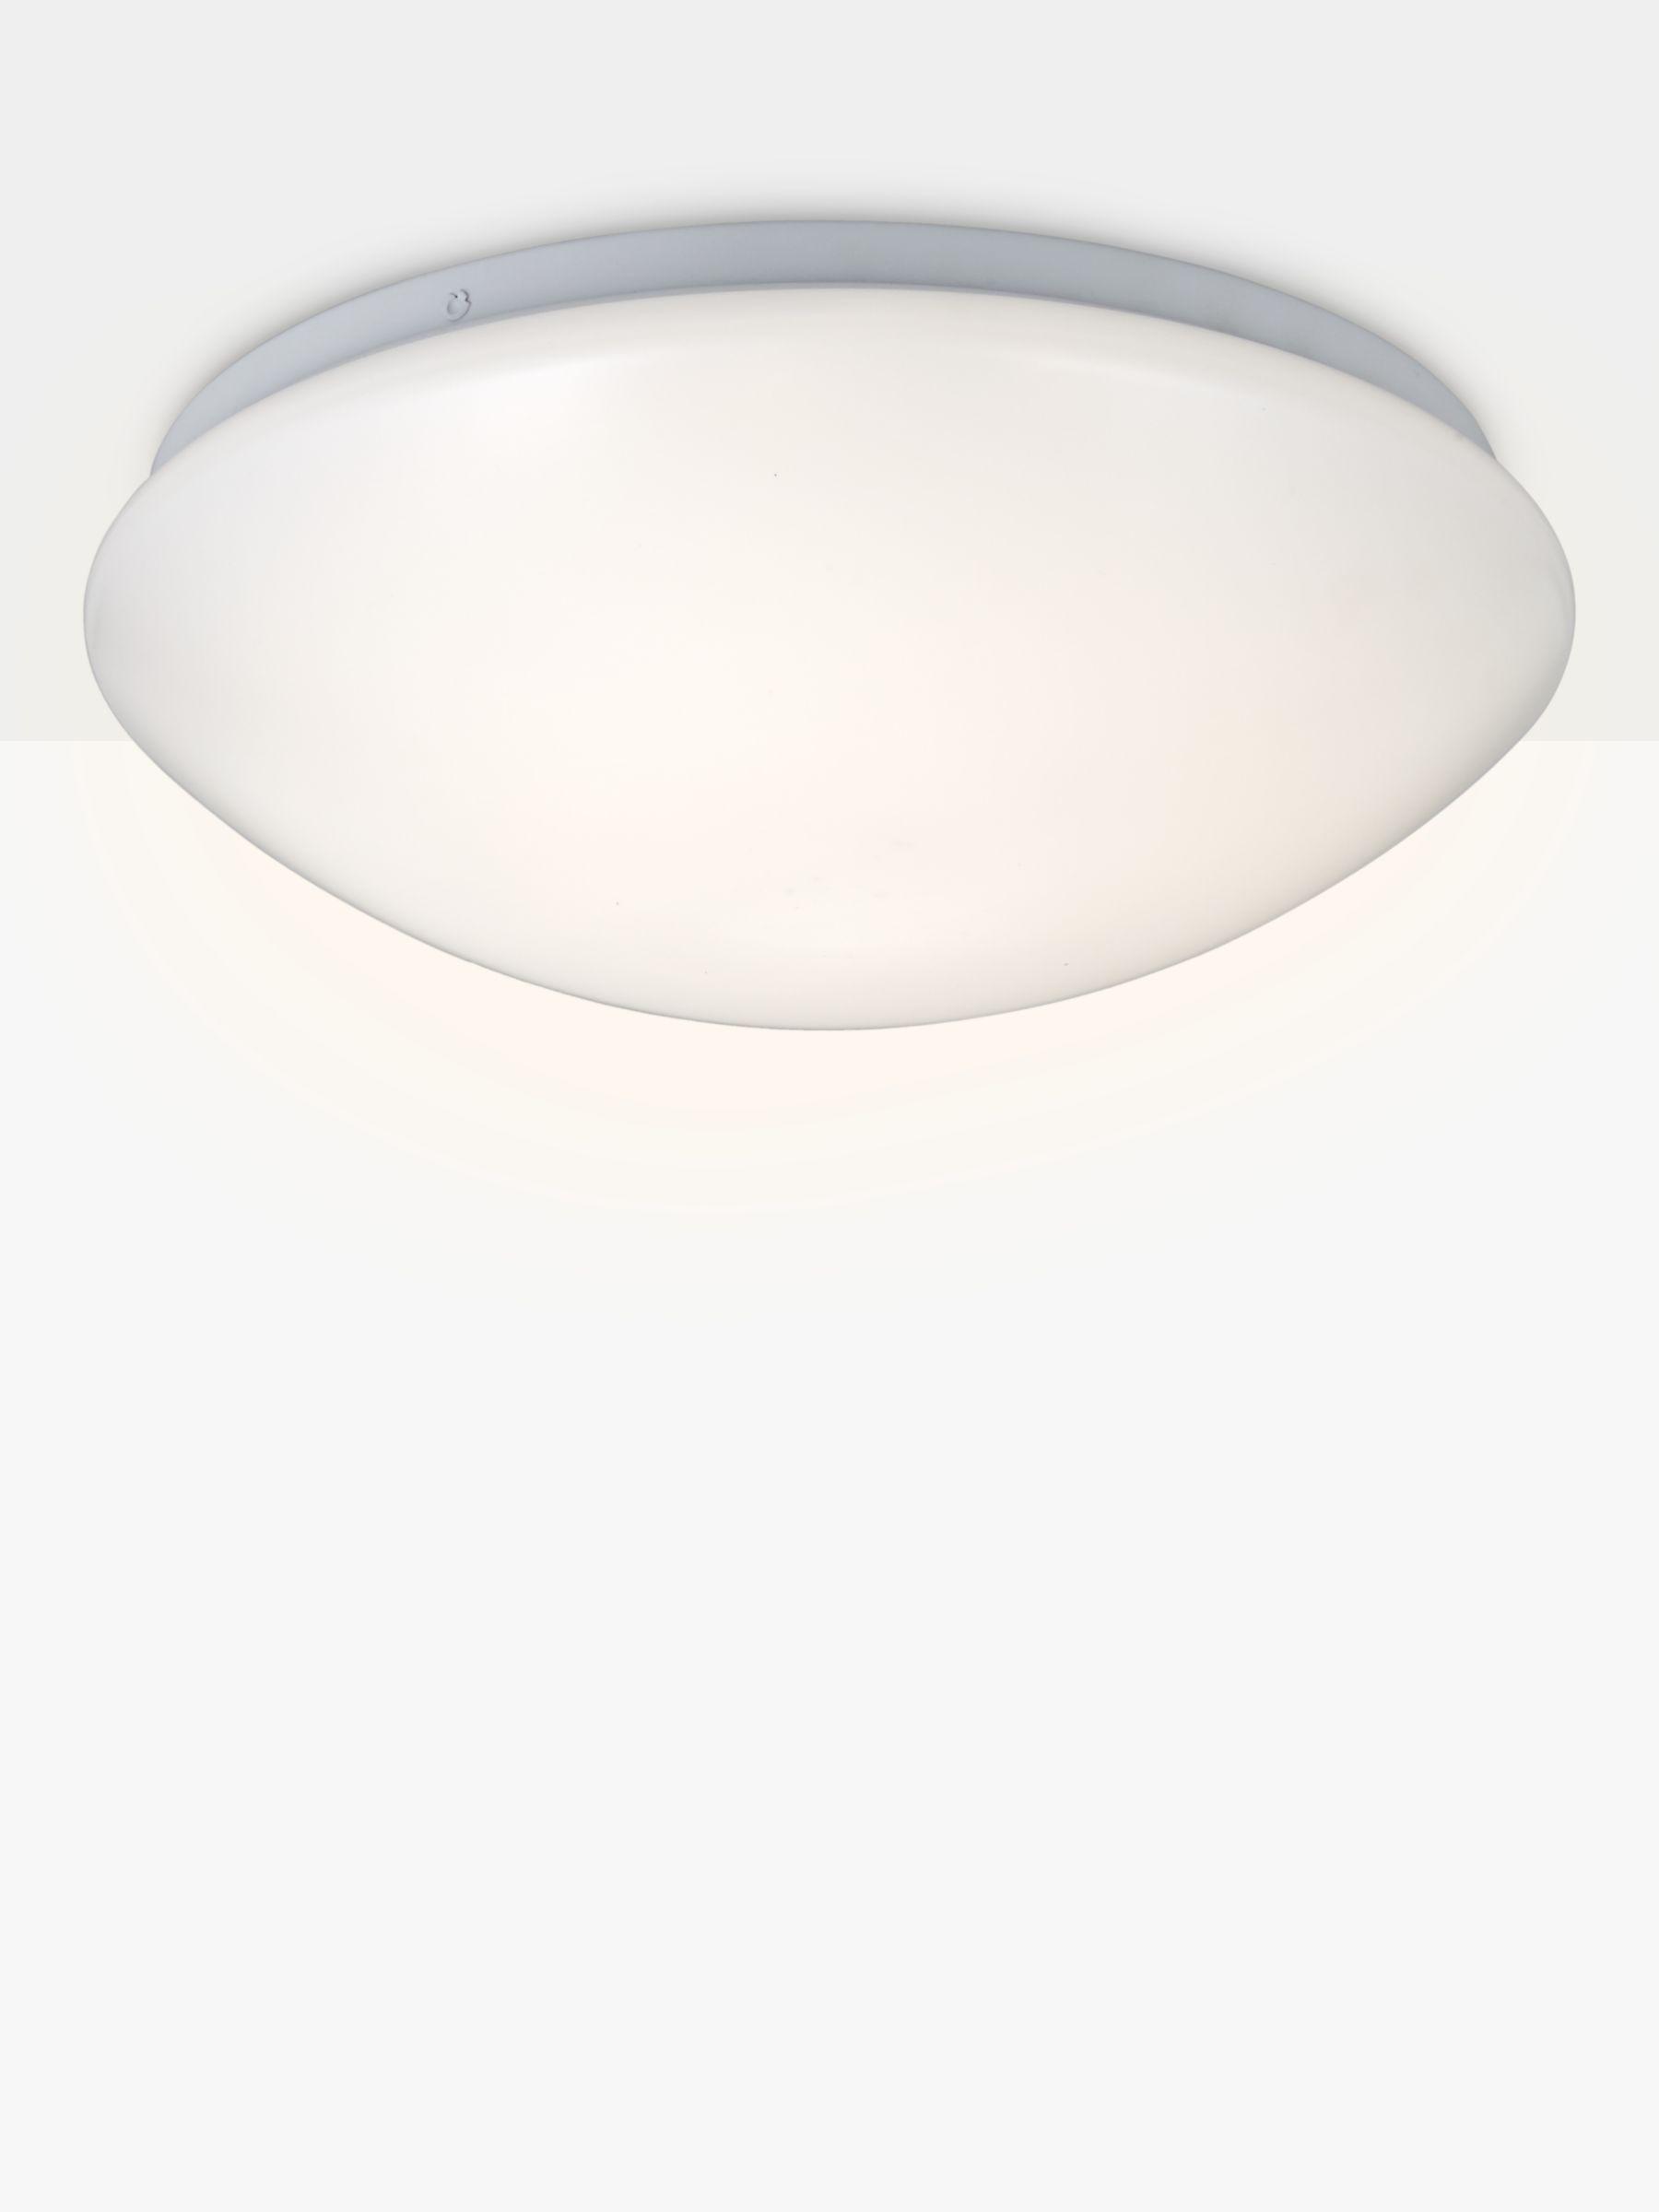 bathroom lighting zones australia Bathroom Design